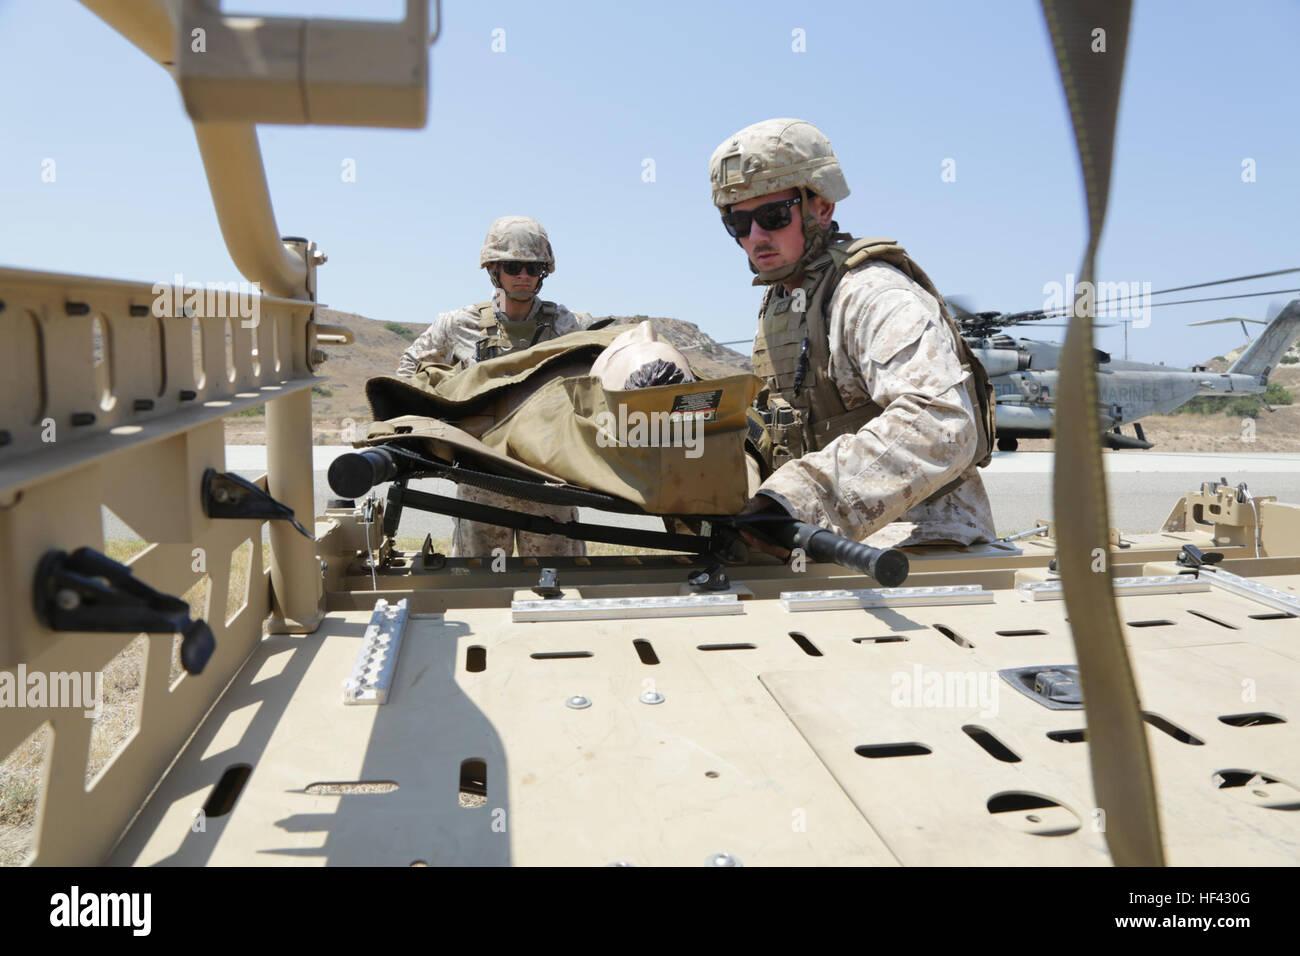 MARINE CORPS BASE CAMP PENDLETON, California (July 29, 2016)  – U.S. Navy corpsmen from 1st  Medical Battalion load Stock Photo